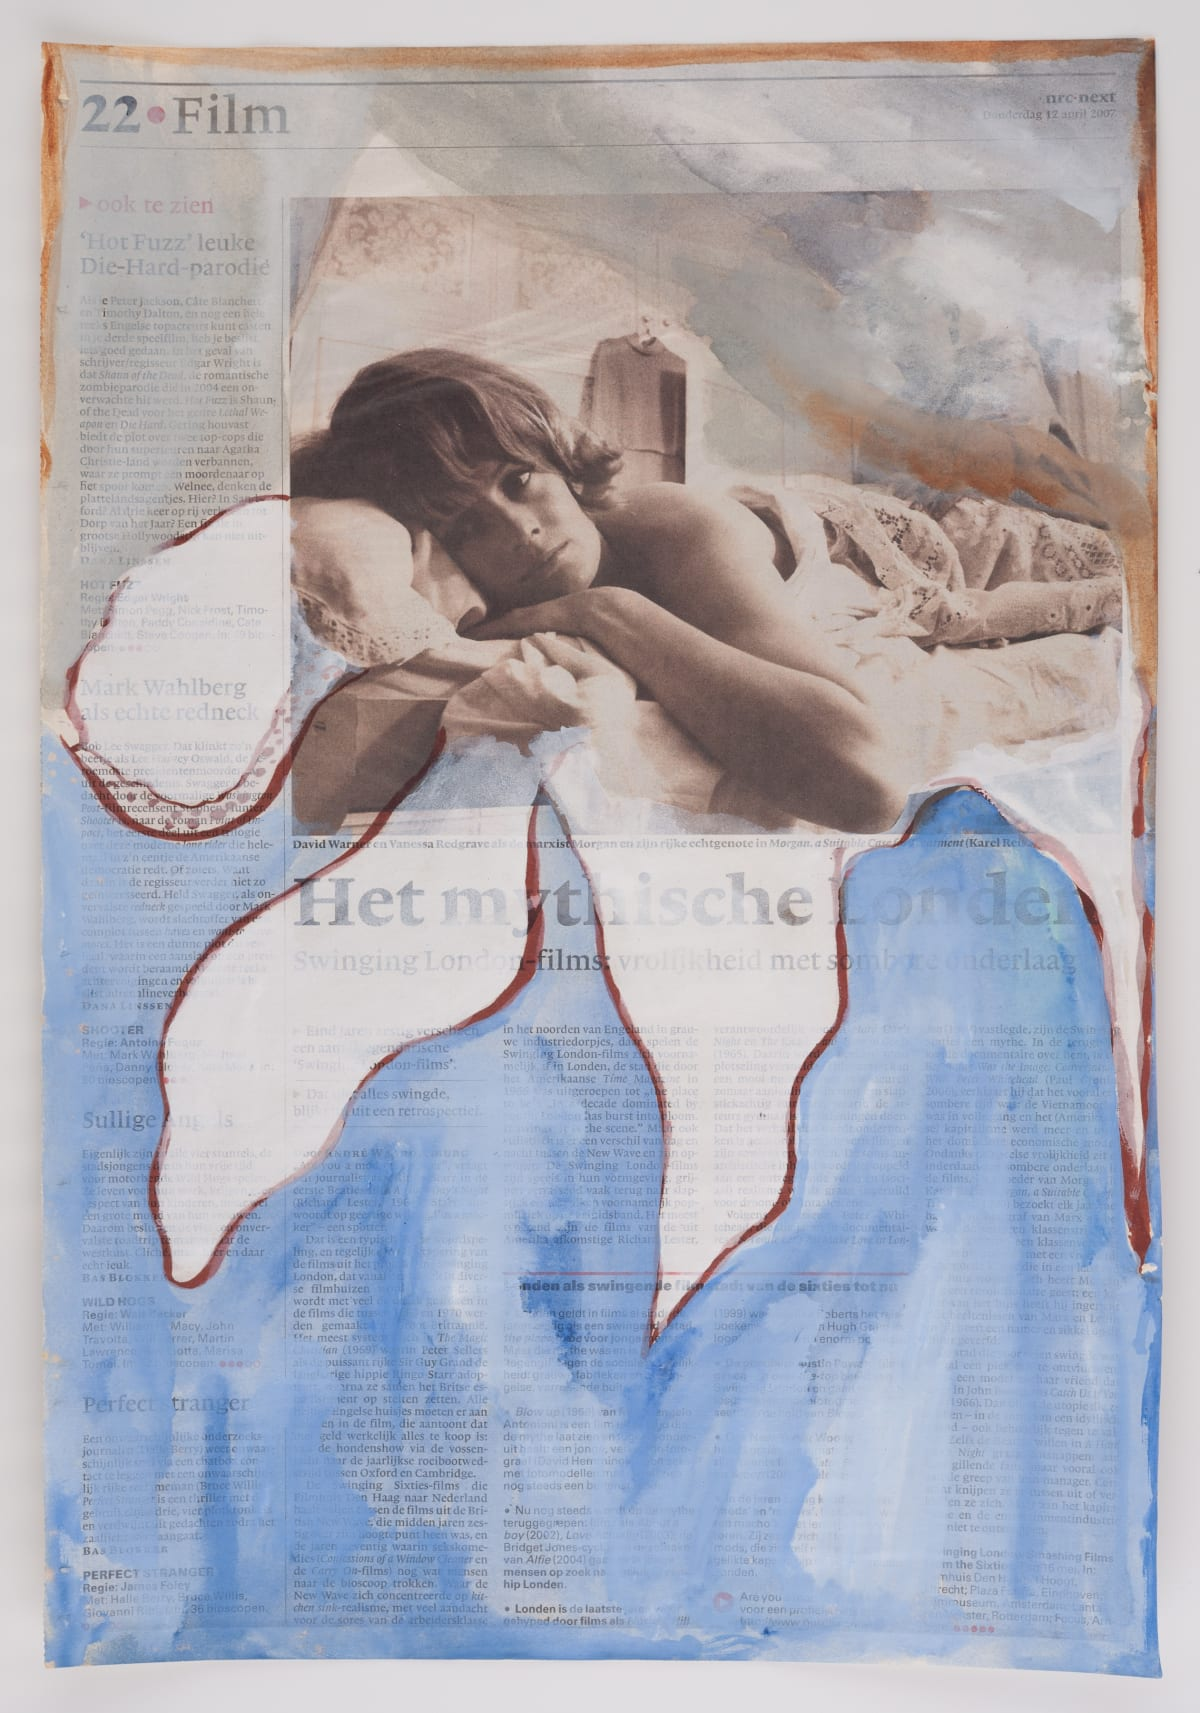 Yvette Taminiau, Mythical London, 2007